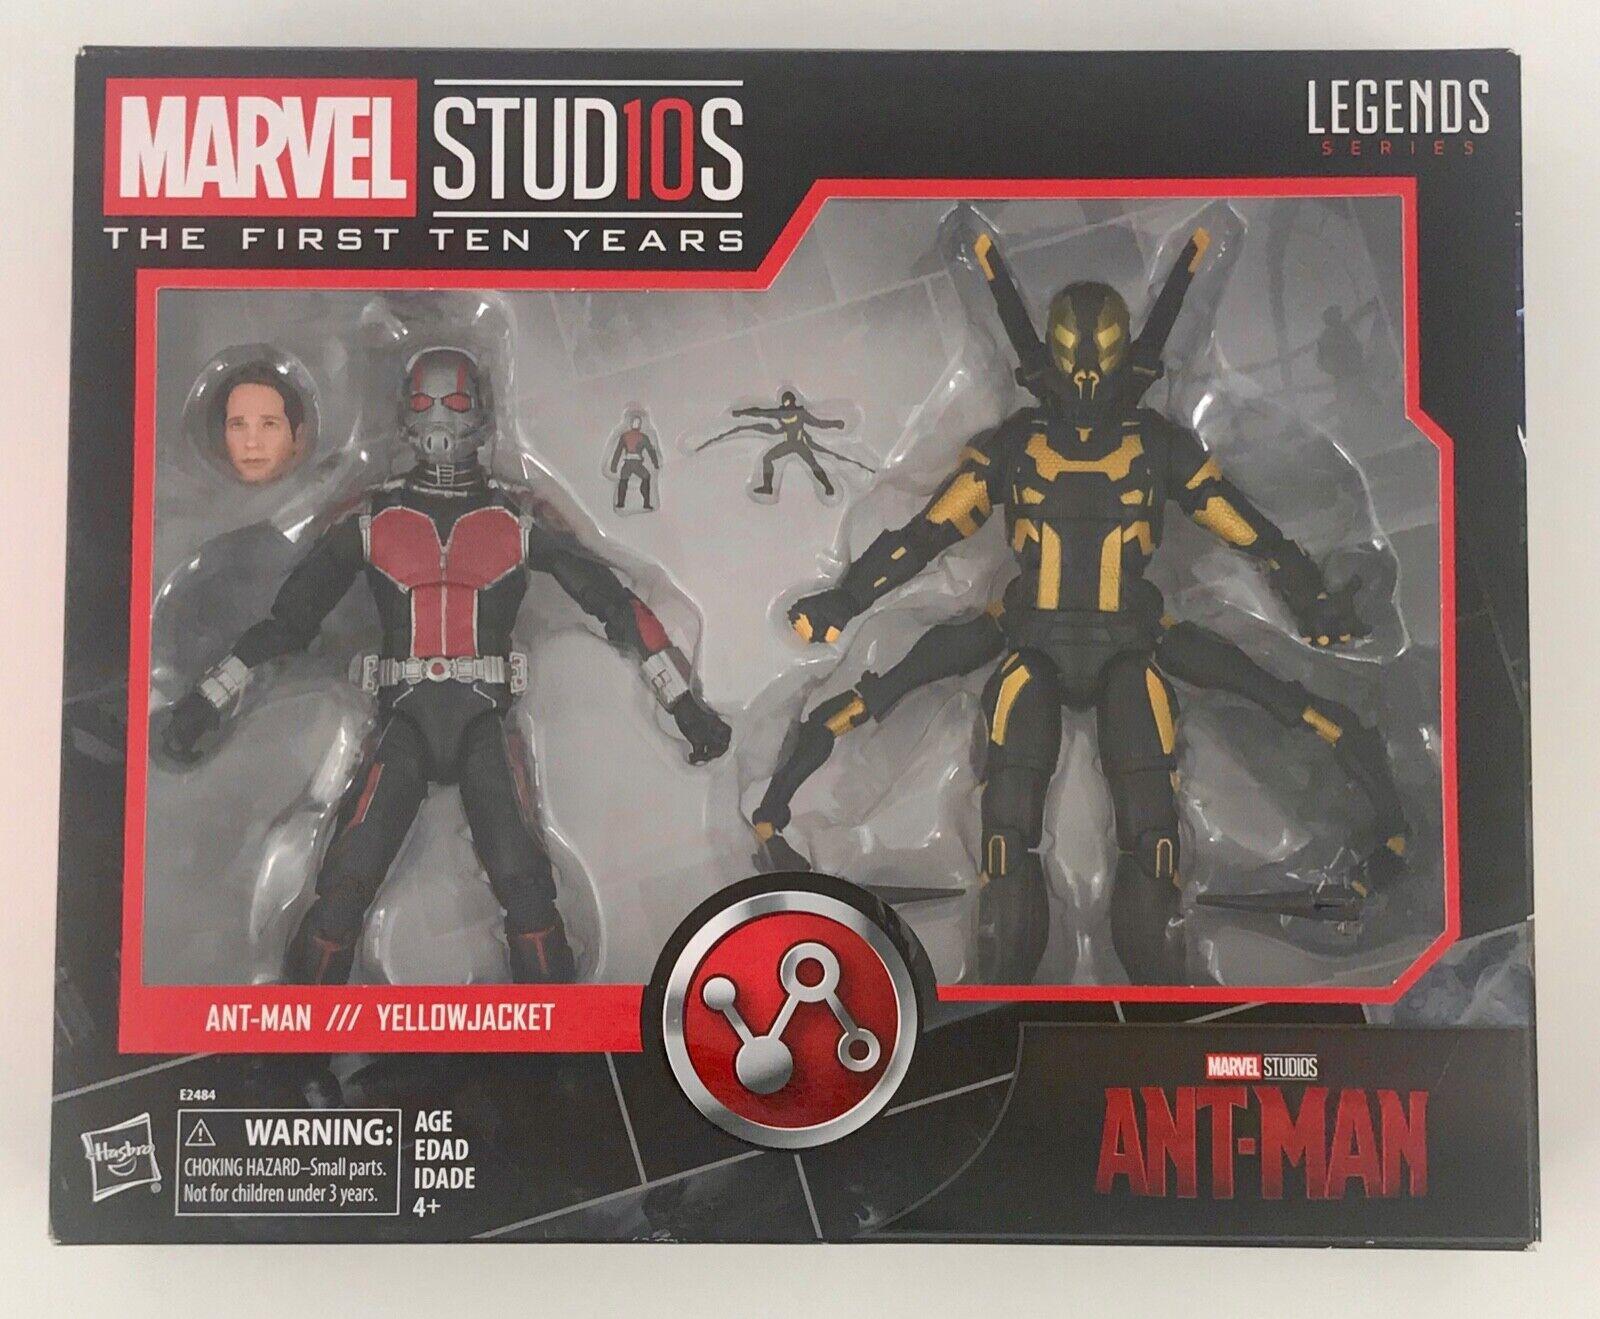 Leyendas Ant-Man & Marvel amarillojacket Marvel Studios los diez primeros años